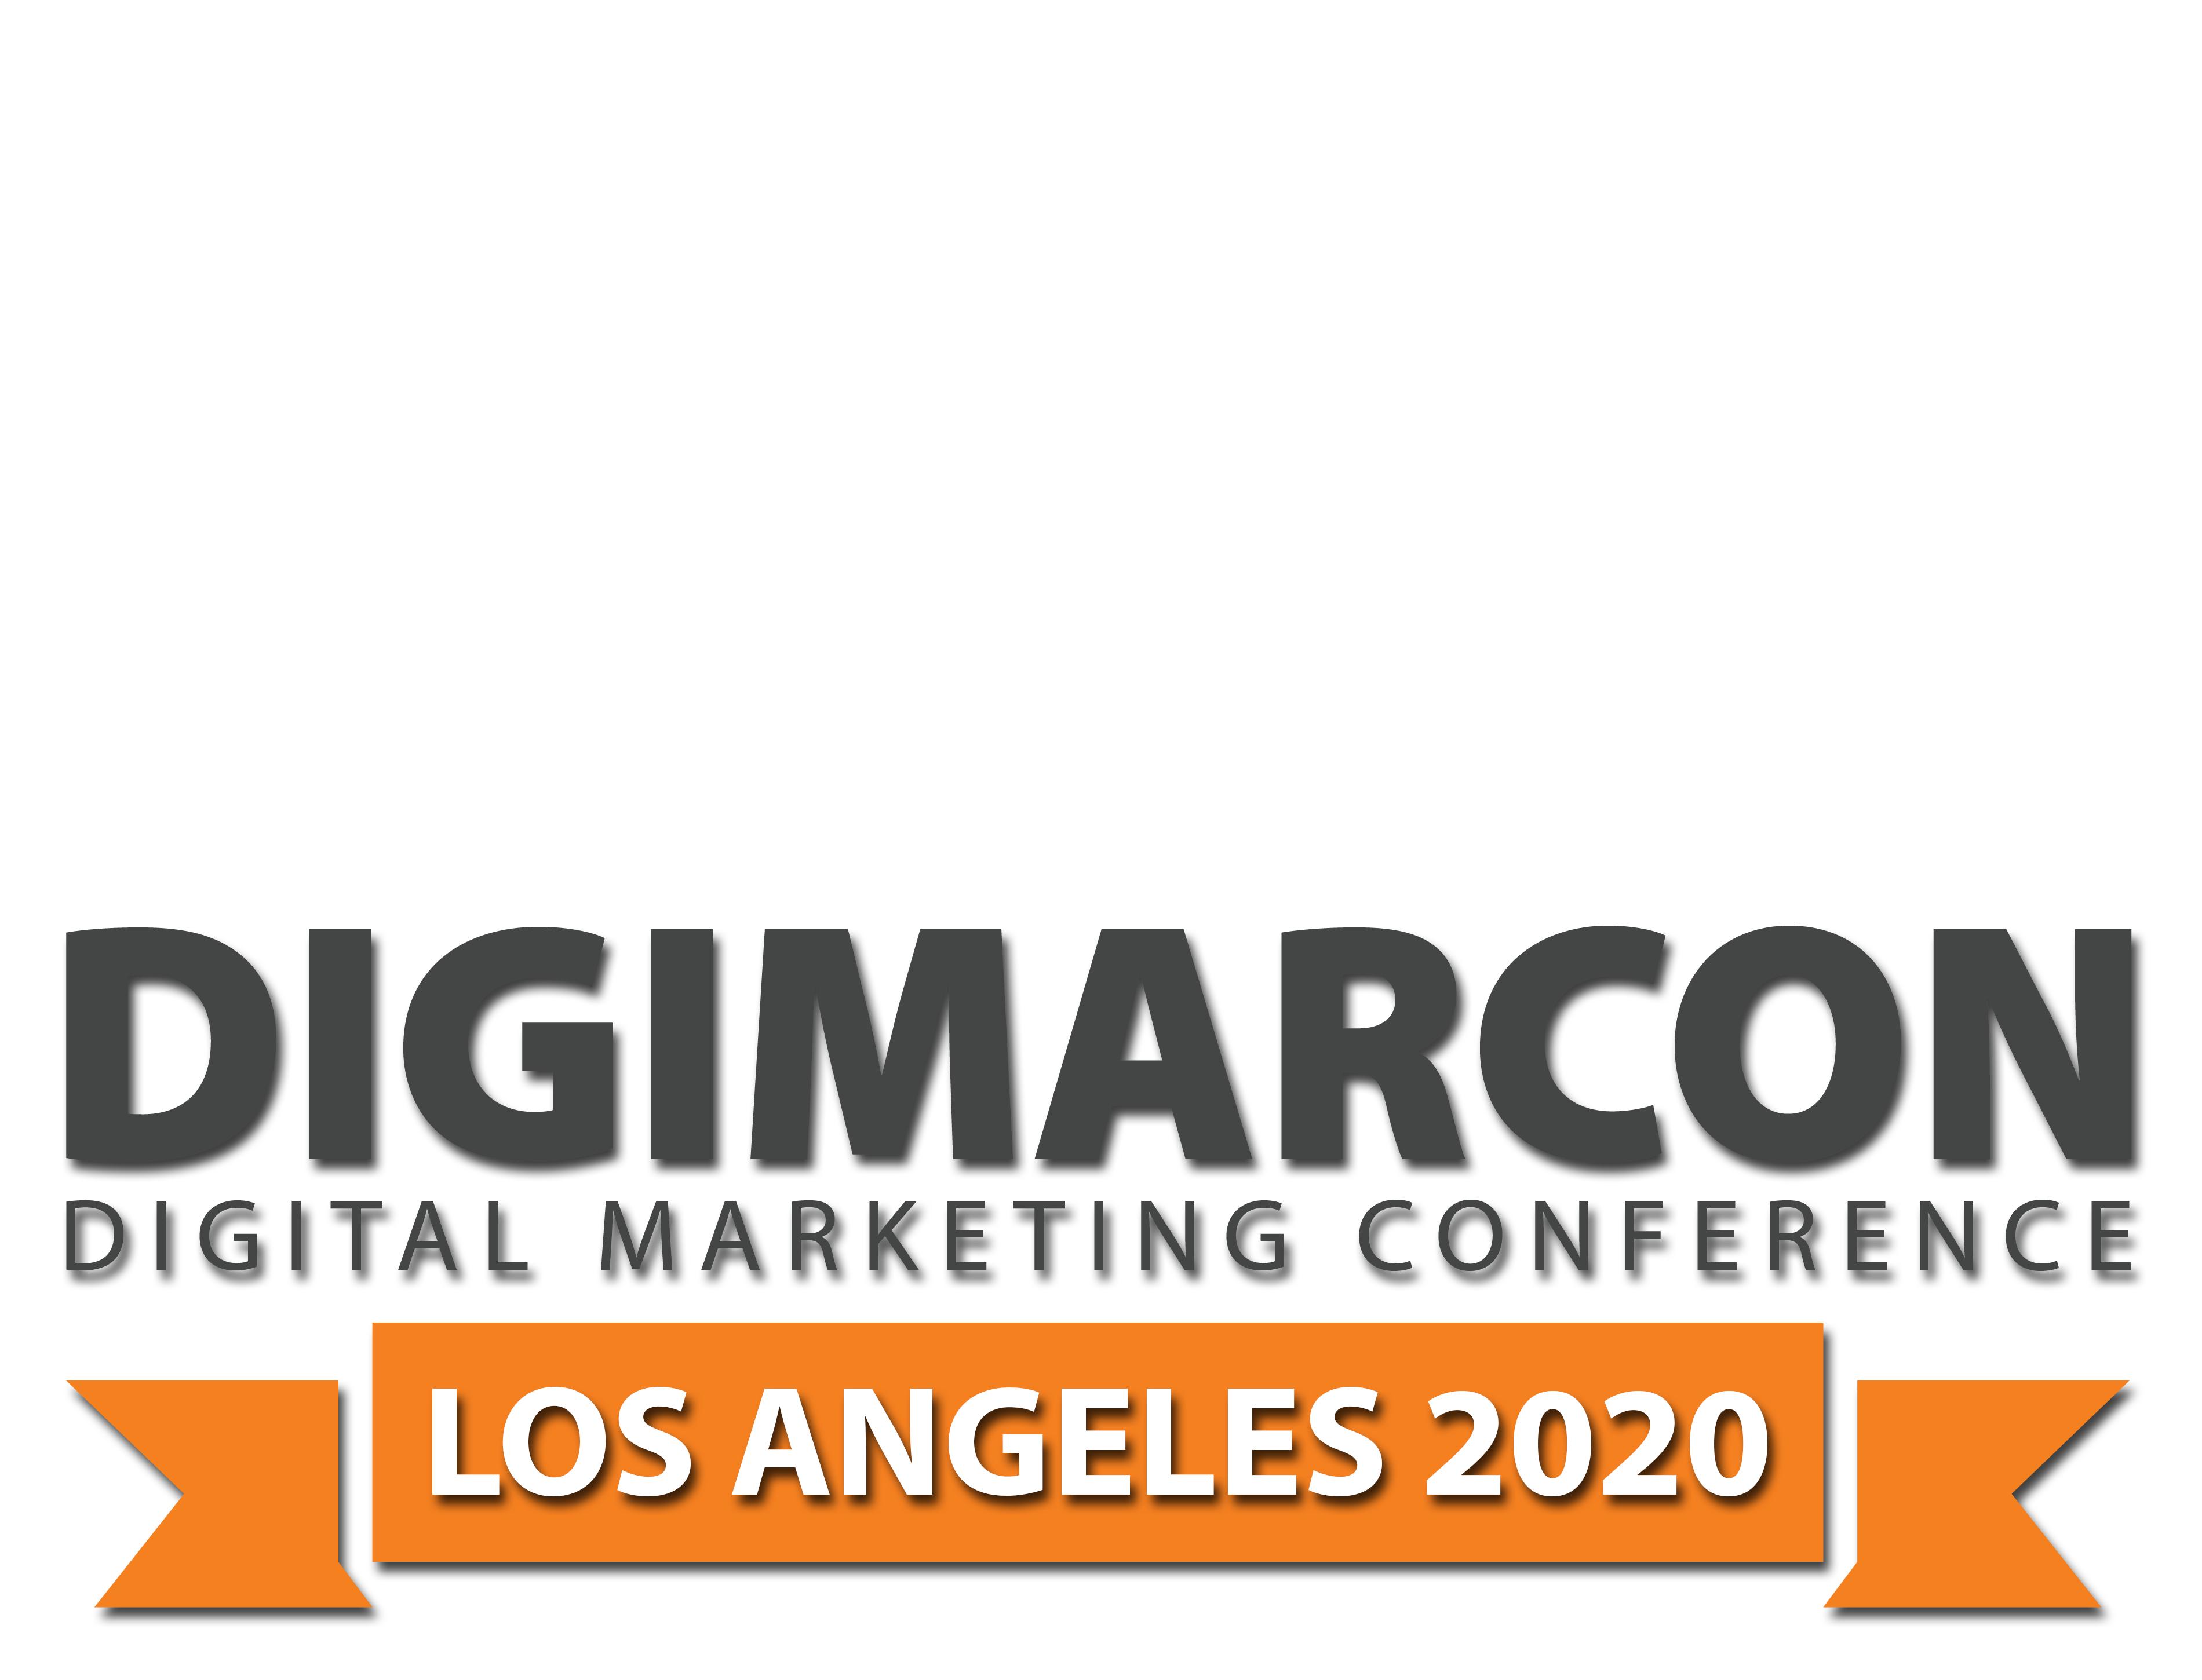 DigiMarCon Los Angeles 2020 · June 10 - 11, 2020 · Digital